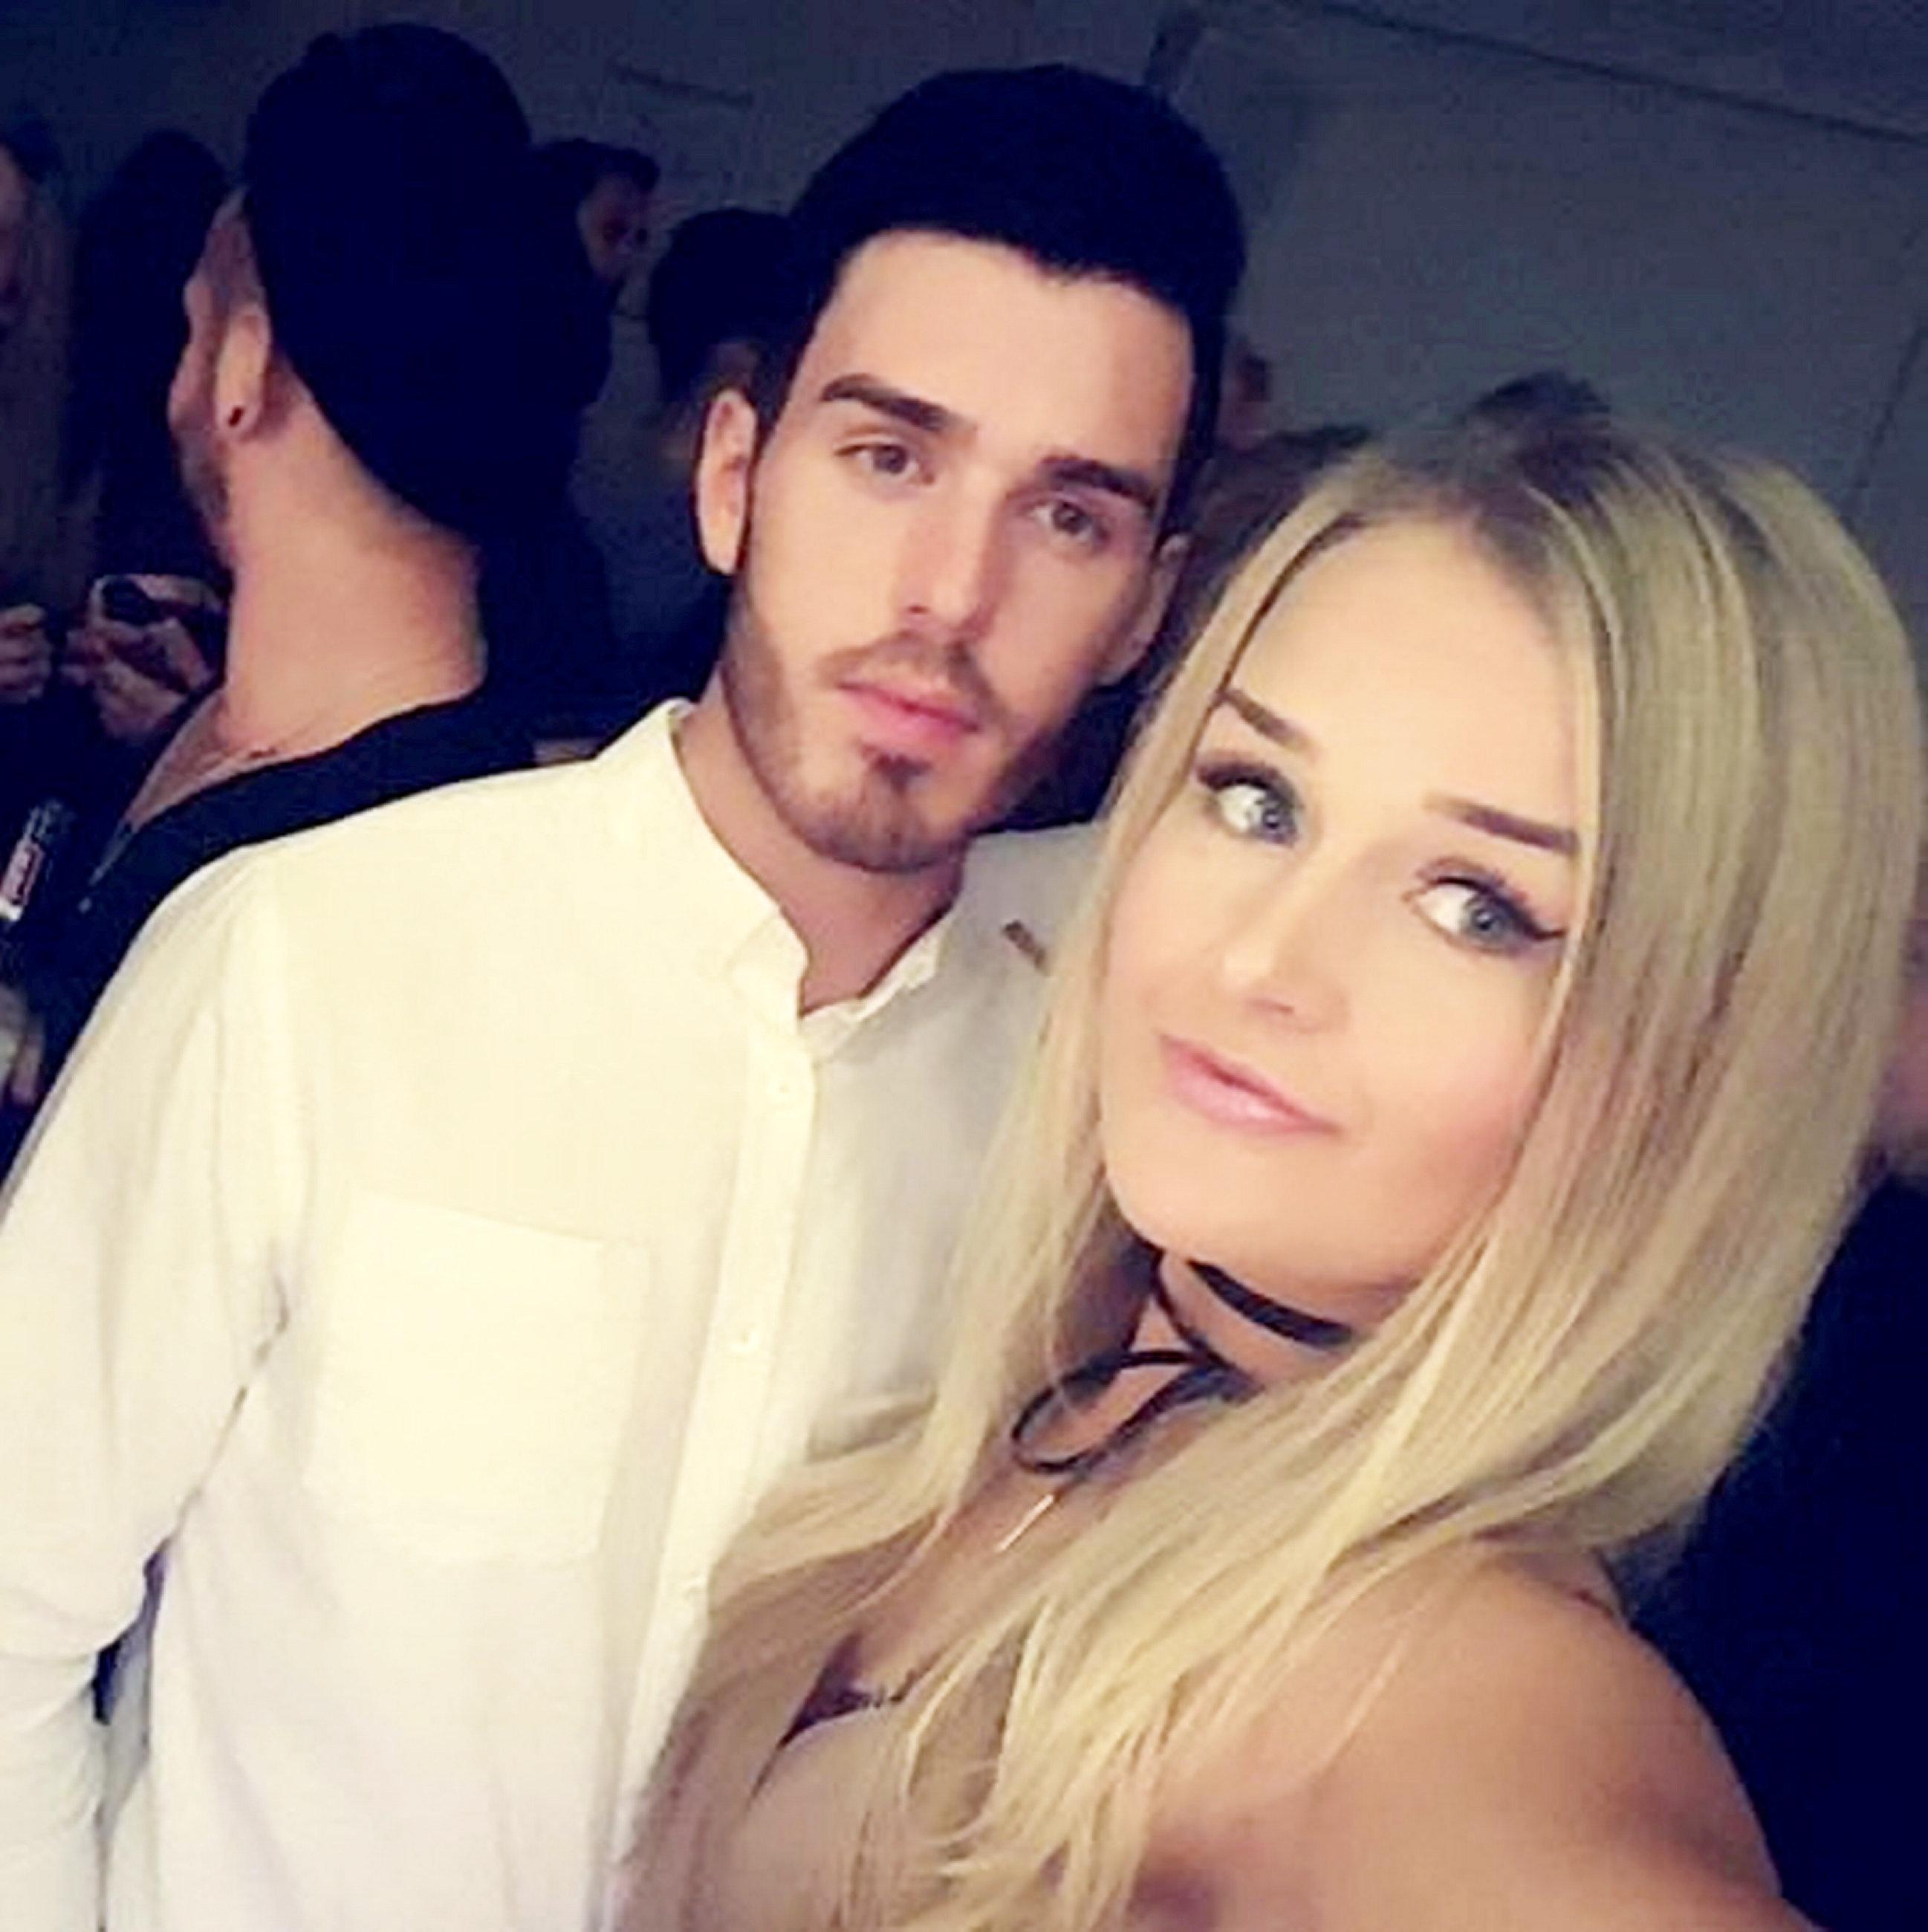 Molly McLaren trial: Joshua Stimpson guilty of murder